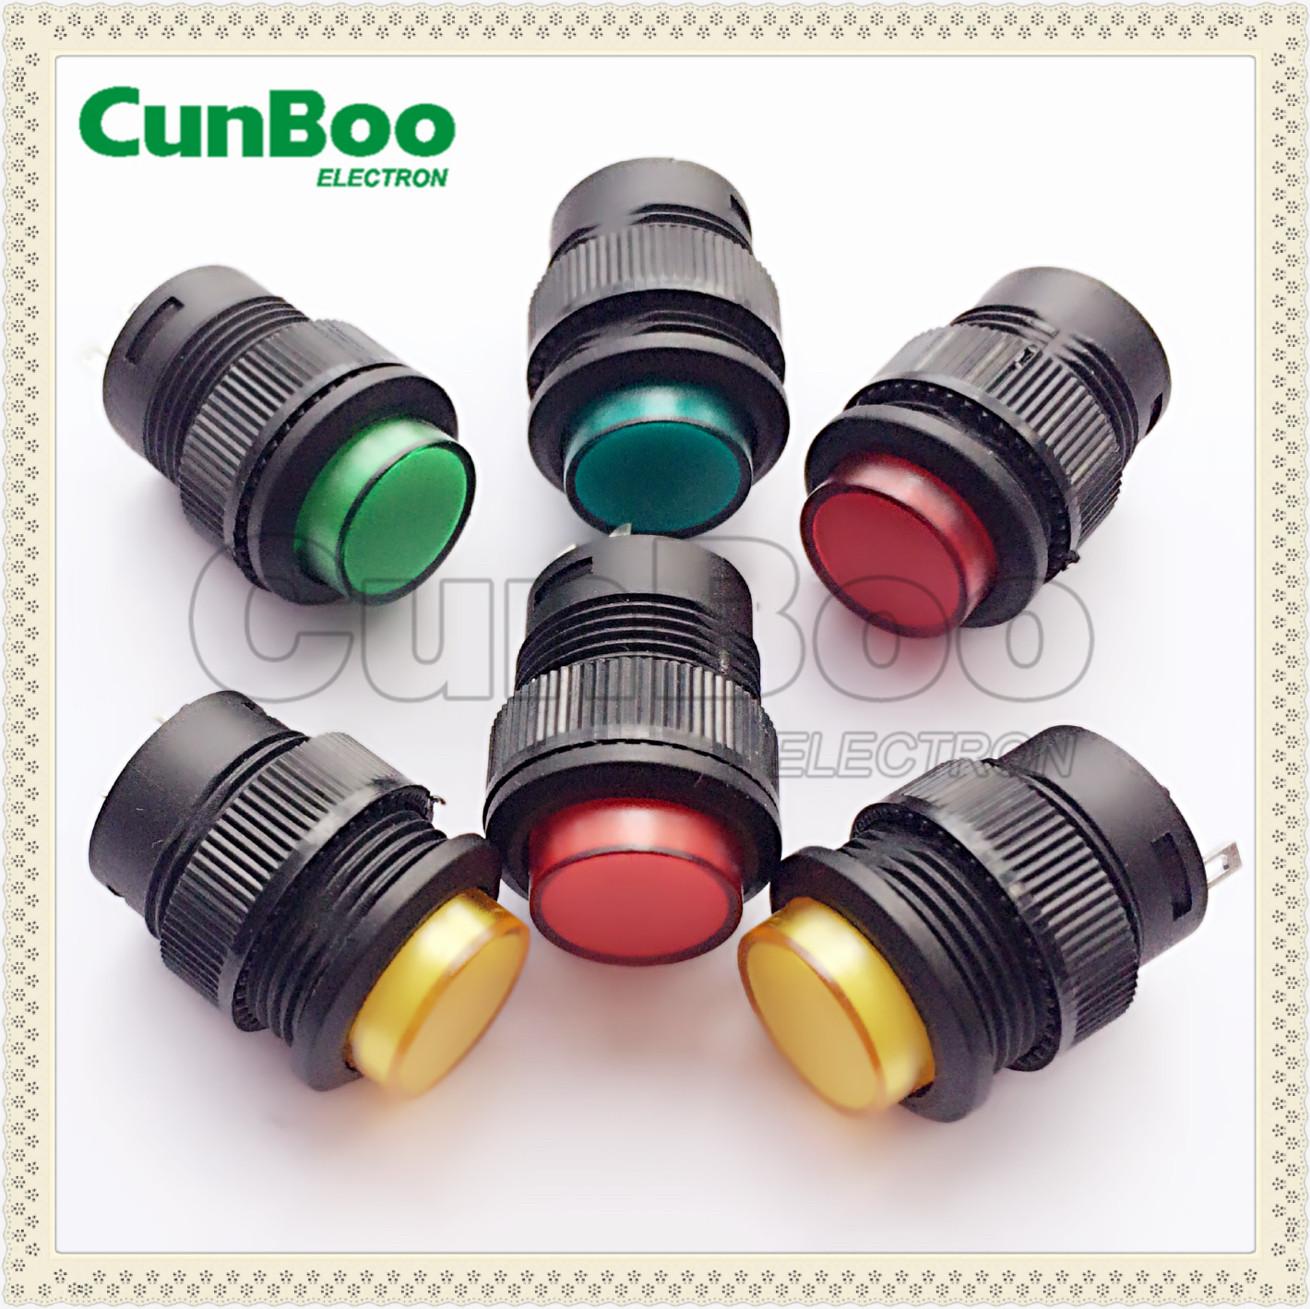 Illuminated round push button switch